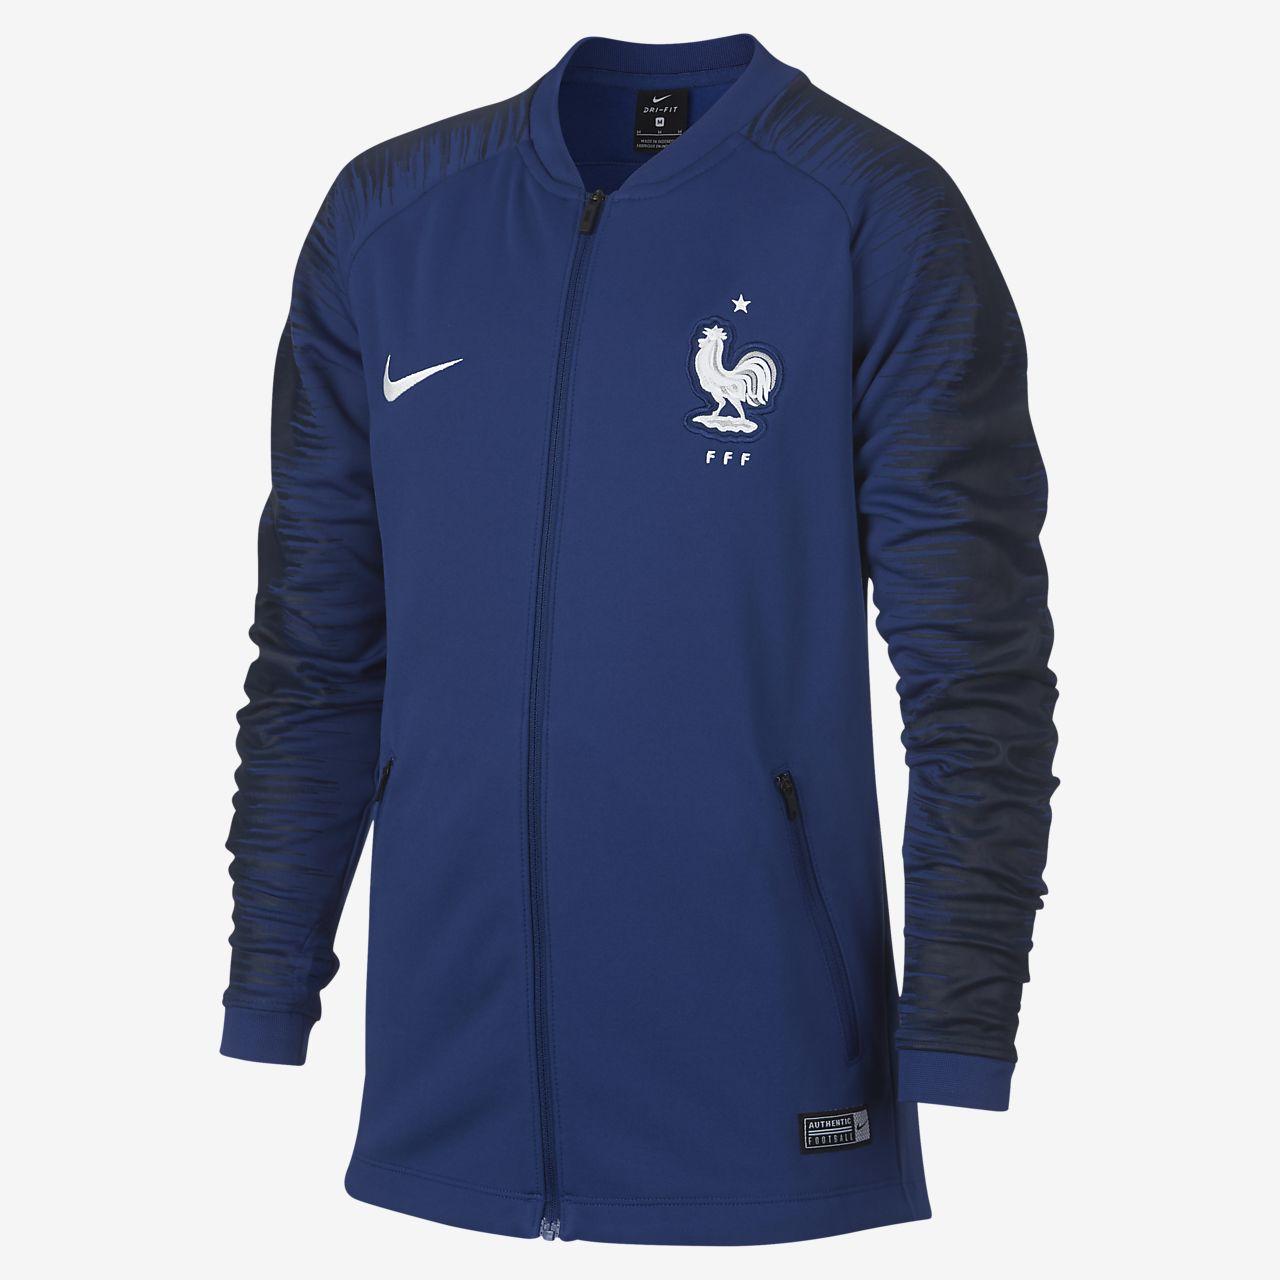 FFF Anthem Older Kids' Football Jacket